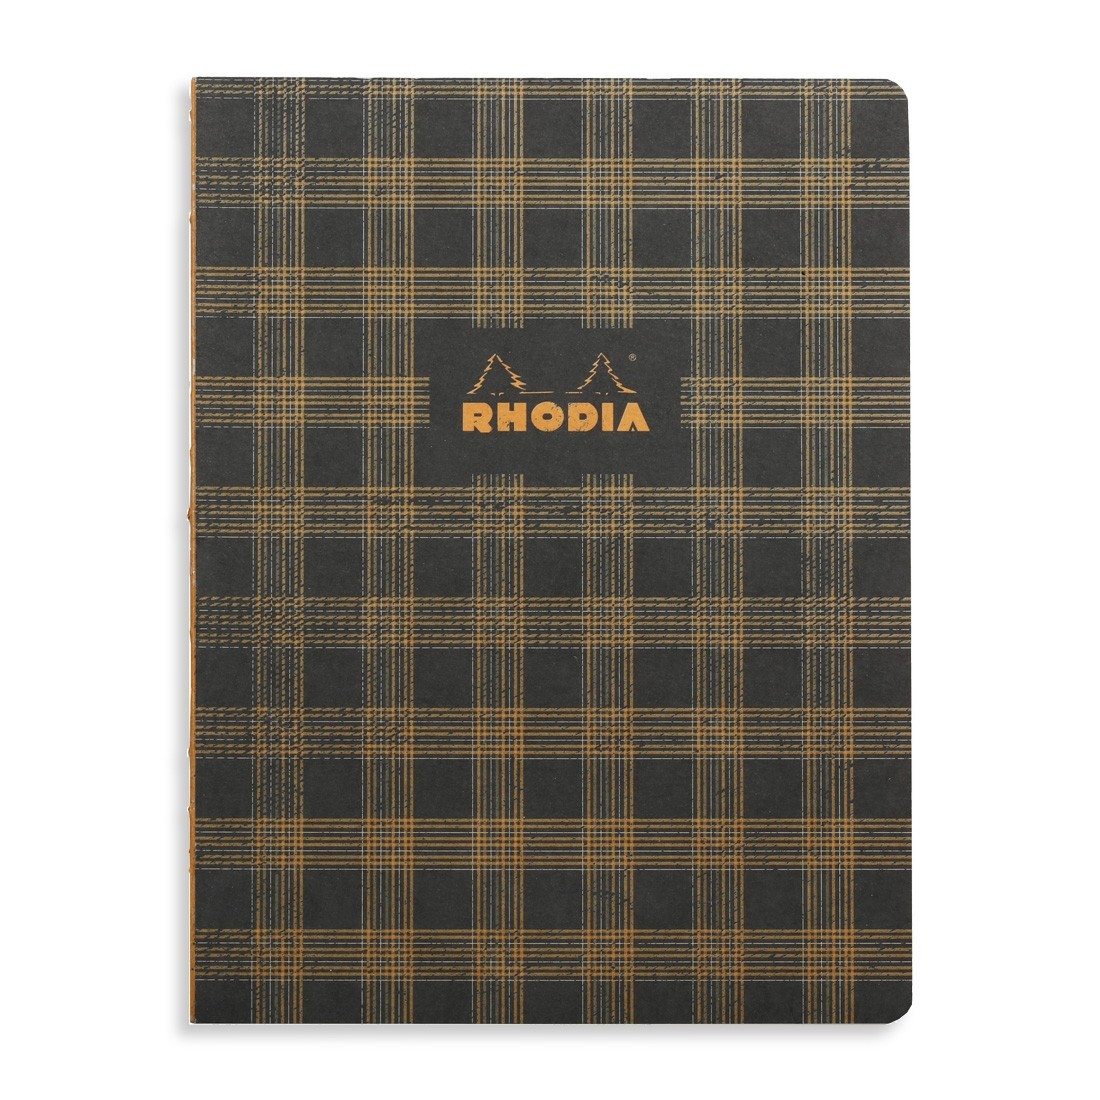 Rhodia Heritage Notebook - Black Tartan